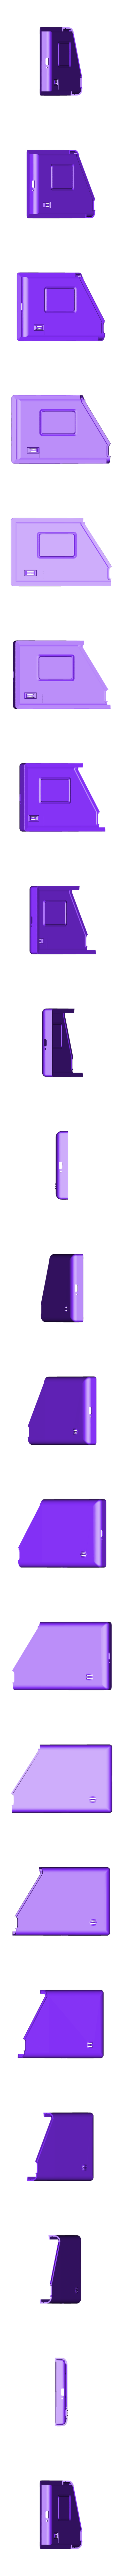 cova113_bottom.stl Download free STL file Fairphone 2 cover • 3D printer model, unwohlpol